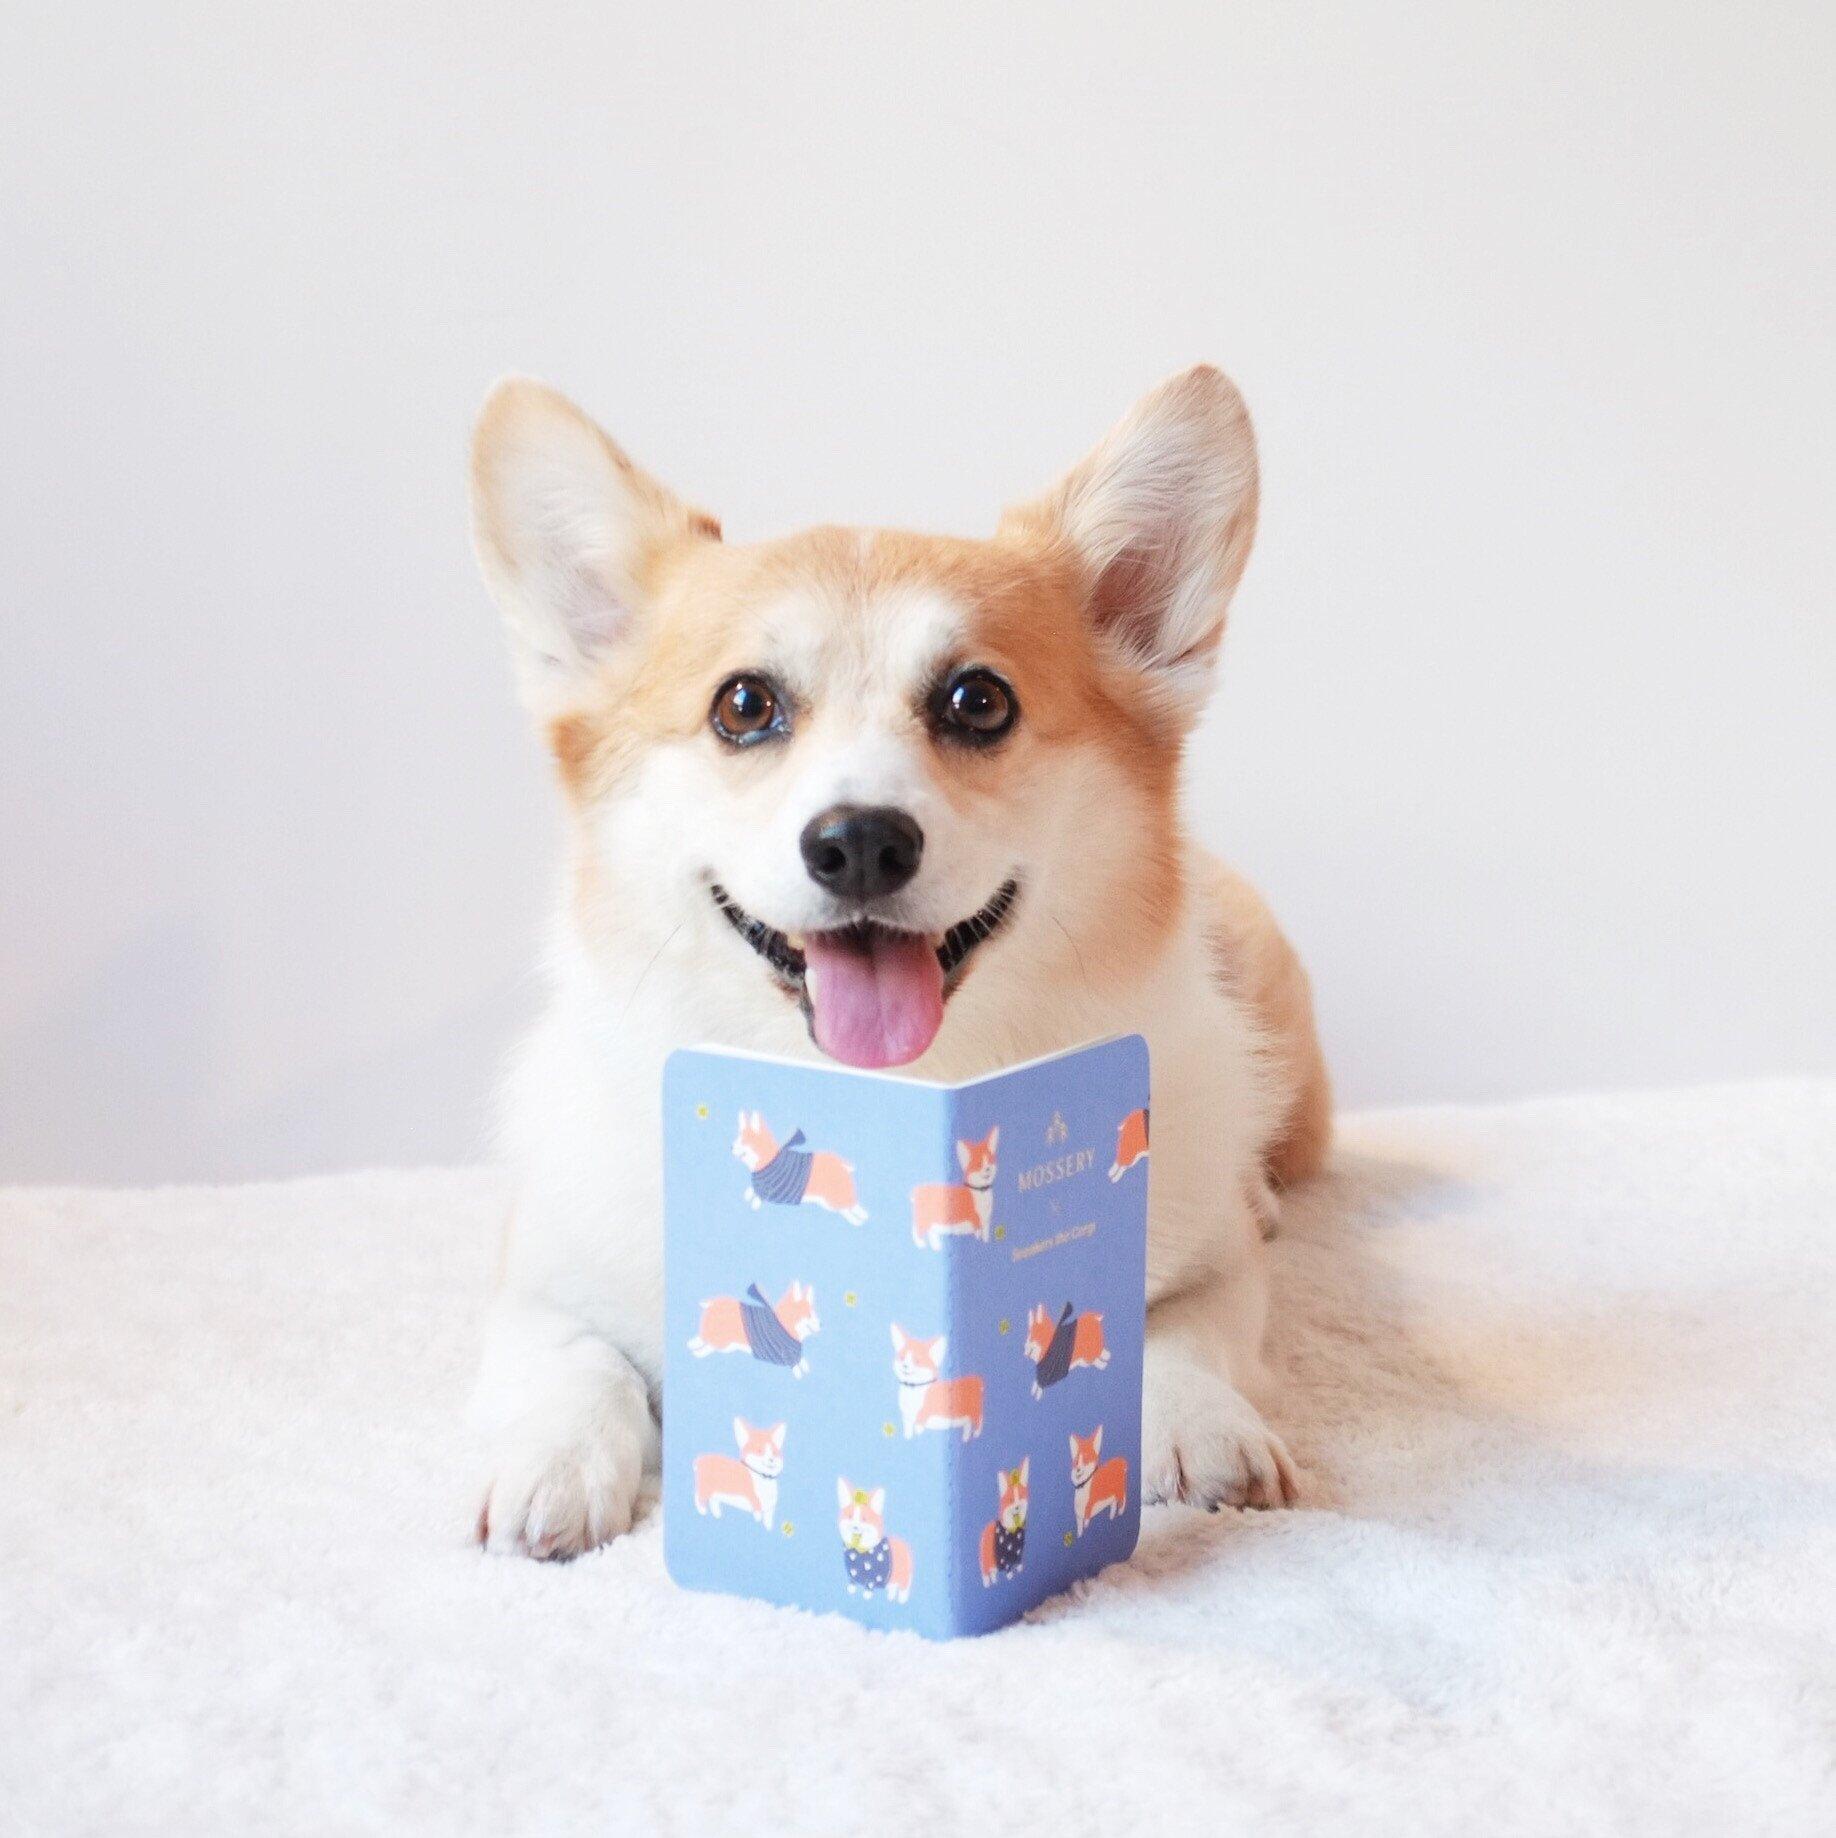 Sneakers The Corgi Pocket Notebook Corgi Cute Corgi Corgi Dog